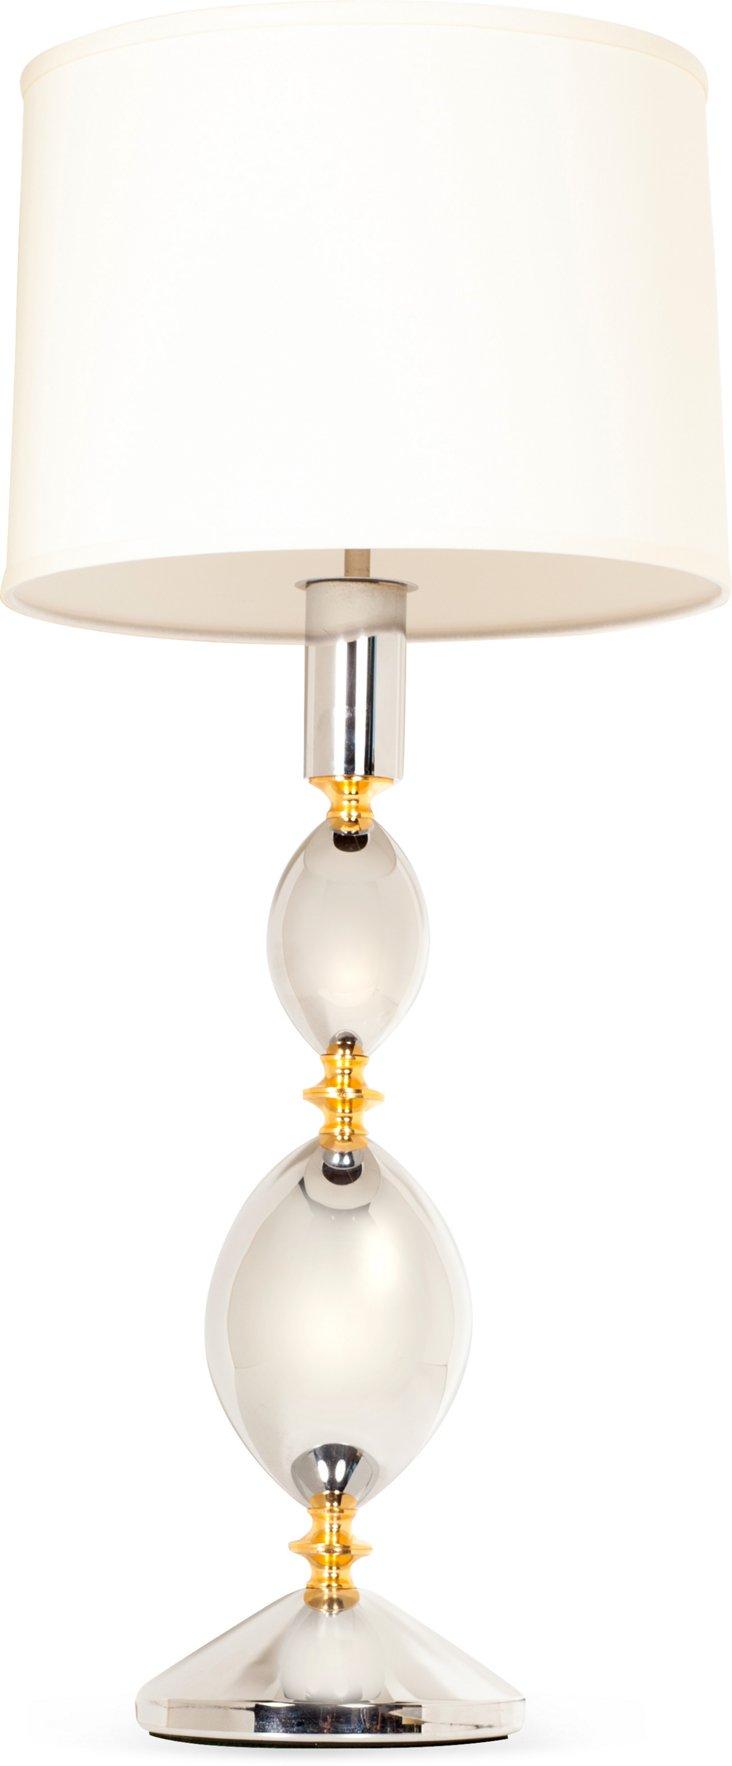 Italian Chrome & Brass Lamp